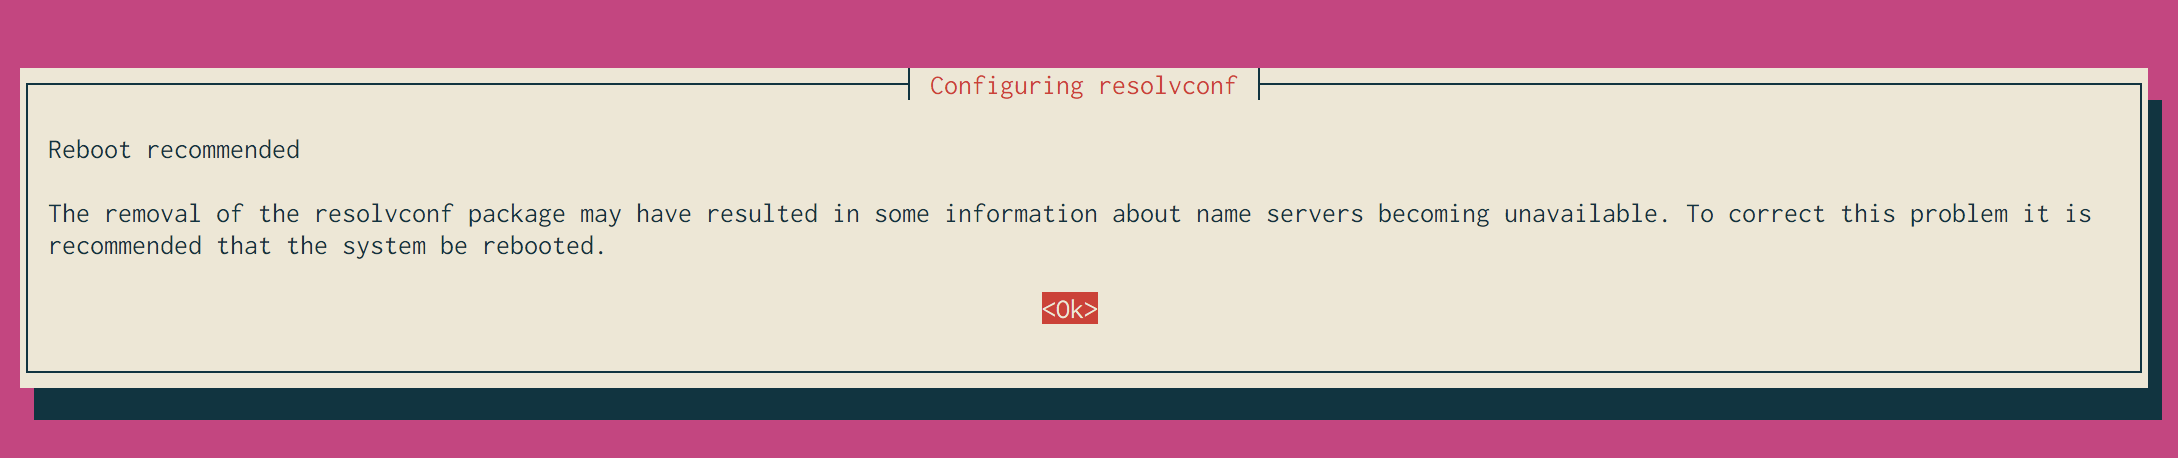 ubuntu OS 업그레이드  18 04 1 LTS  커널패닉시 /boot 영역 공간이